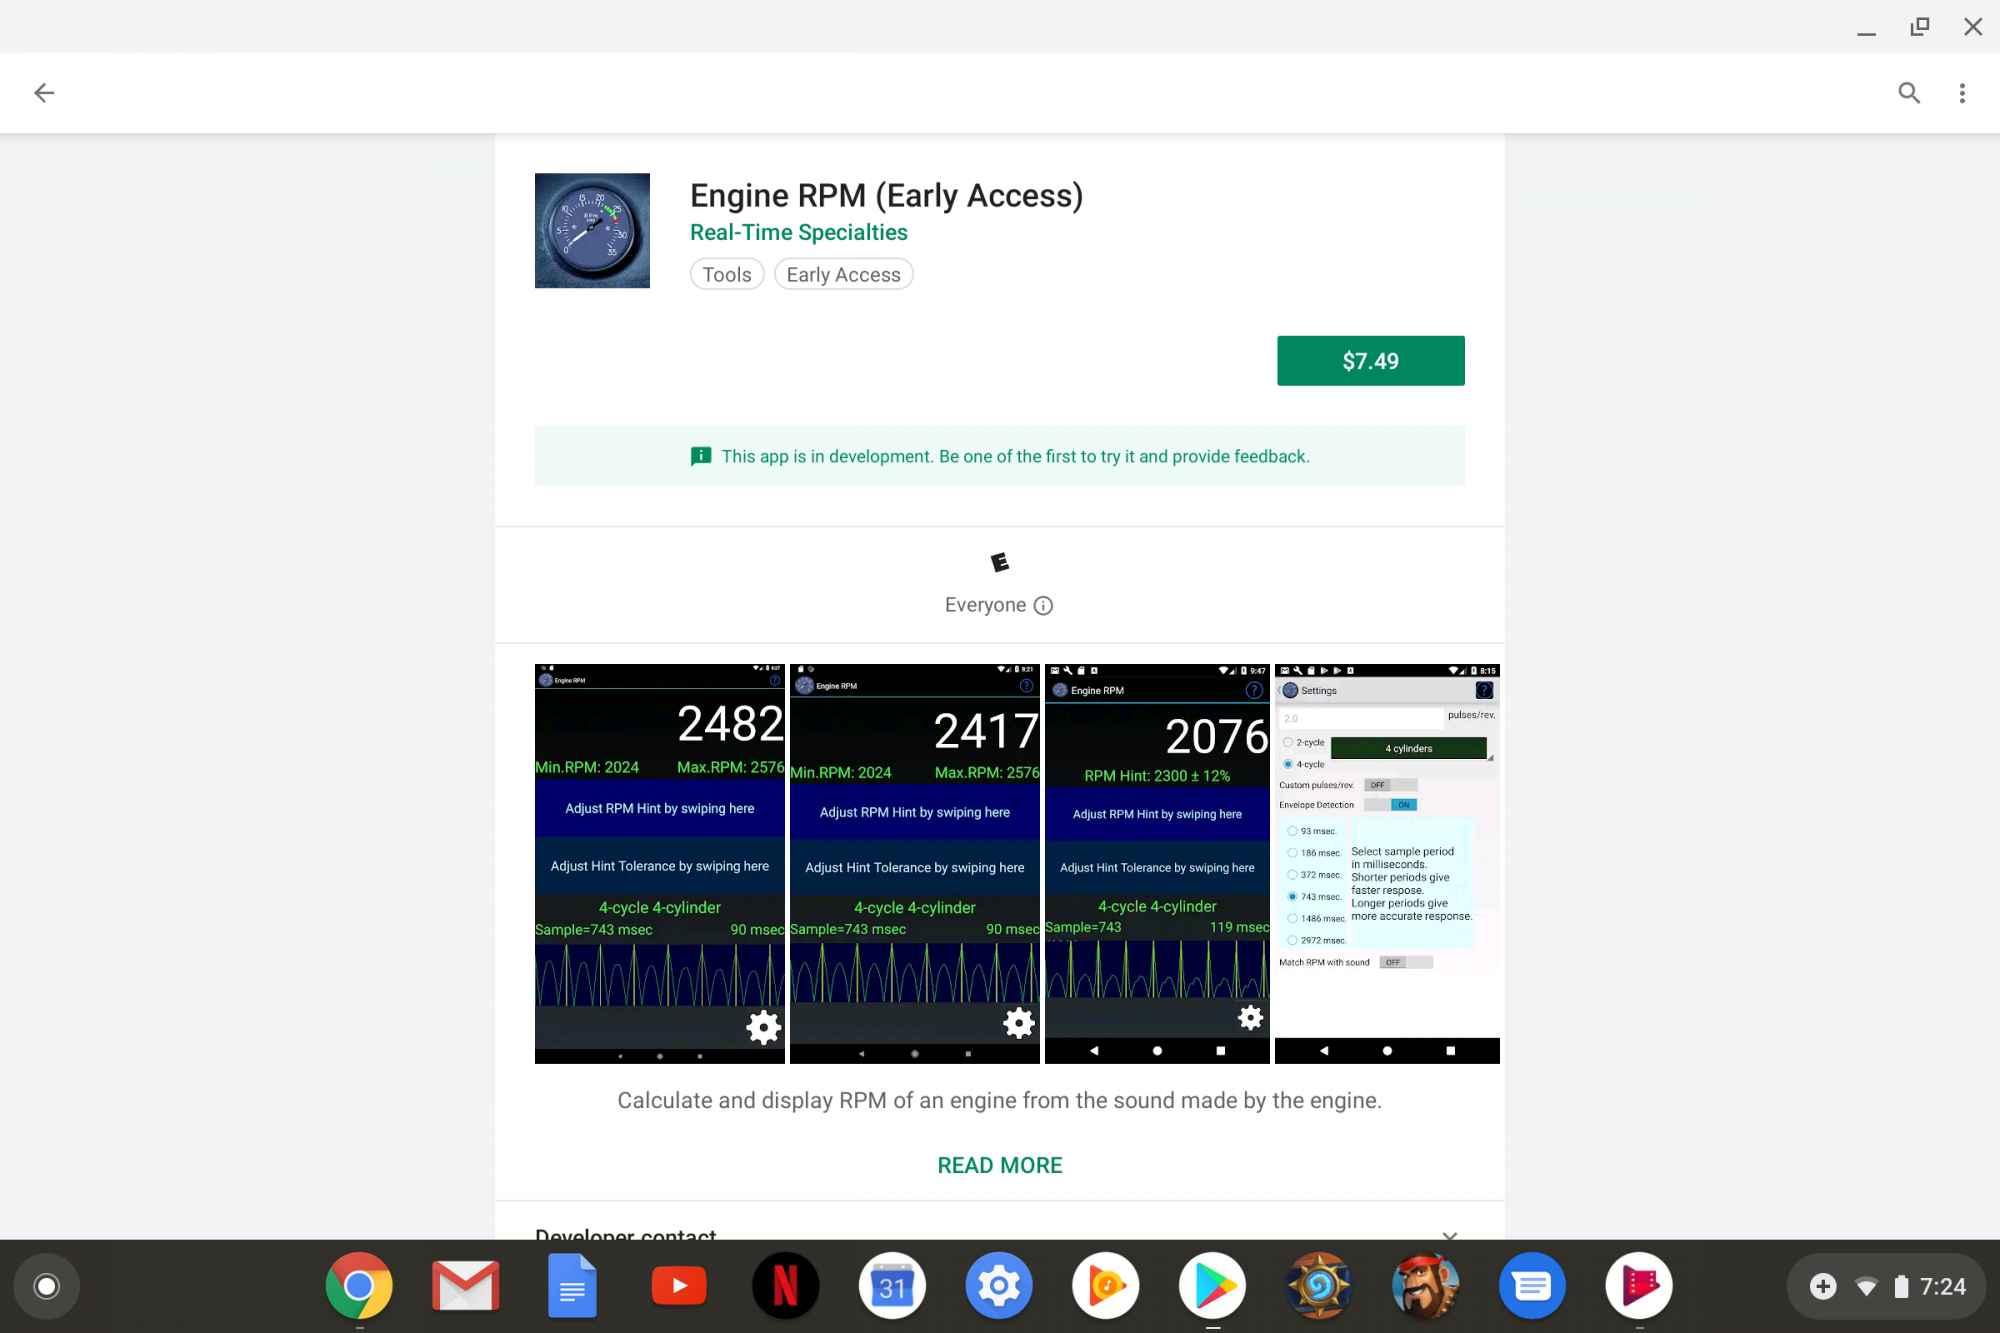 Screenshot 2019-07-18 at 7.24.41 PM.png